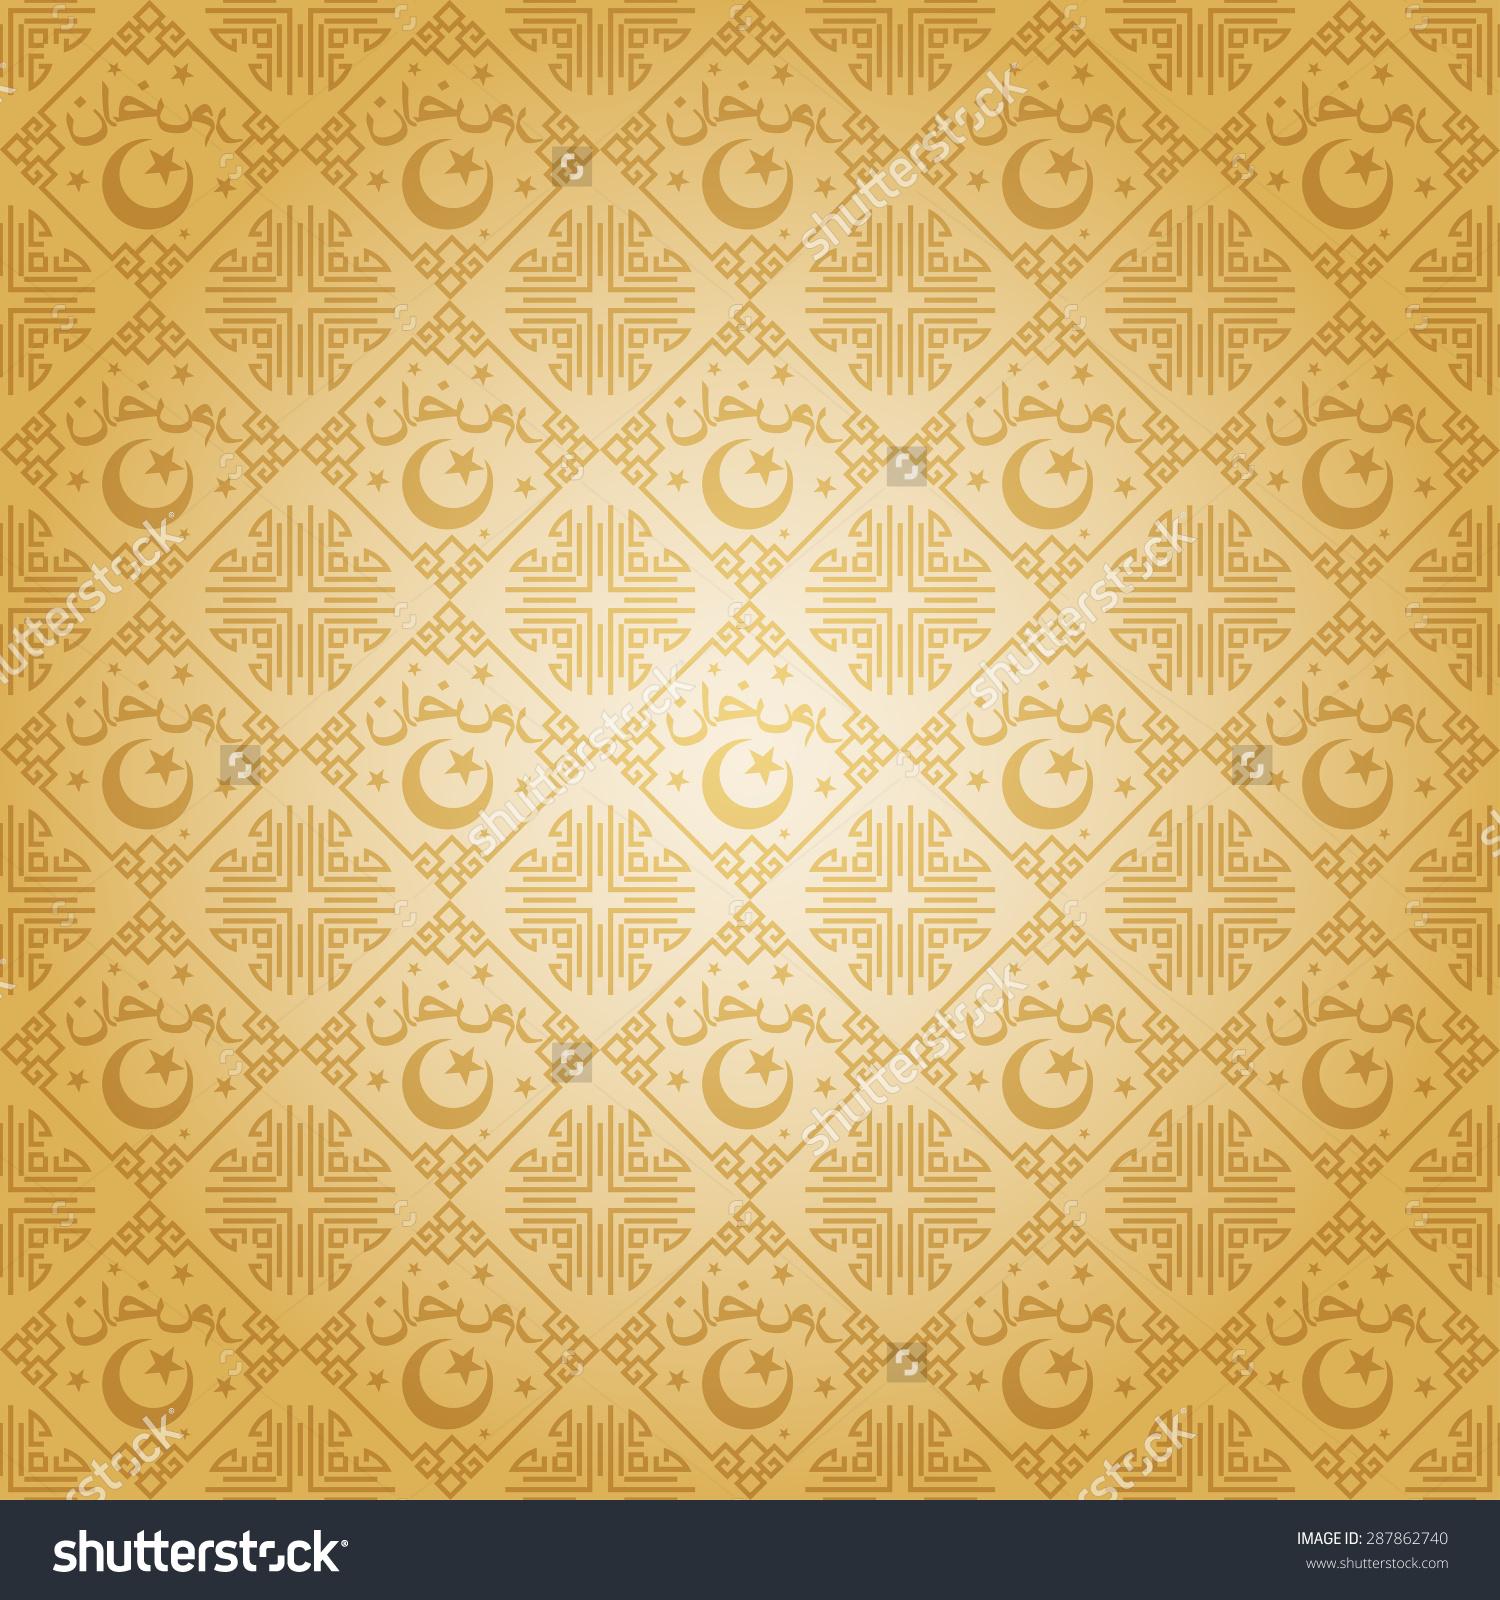 Arabic Invitation Cards is luxury invitation design